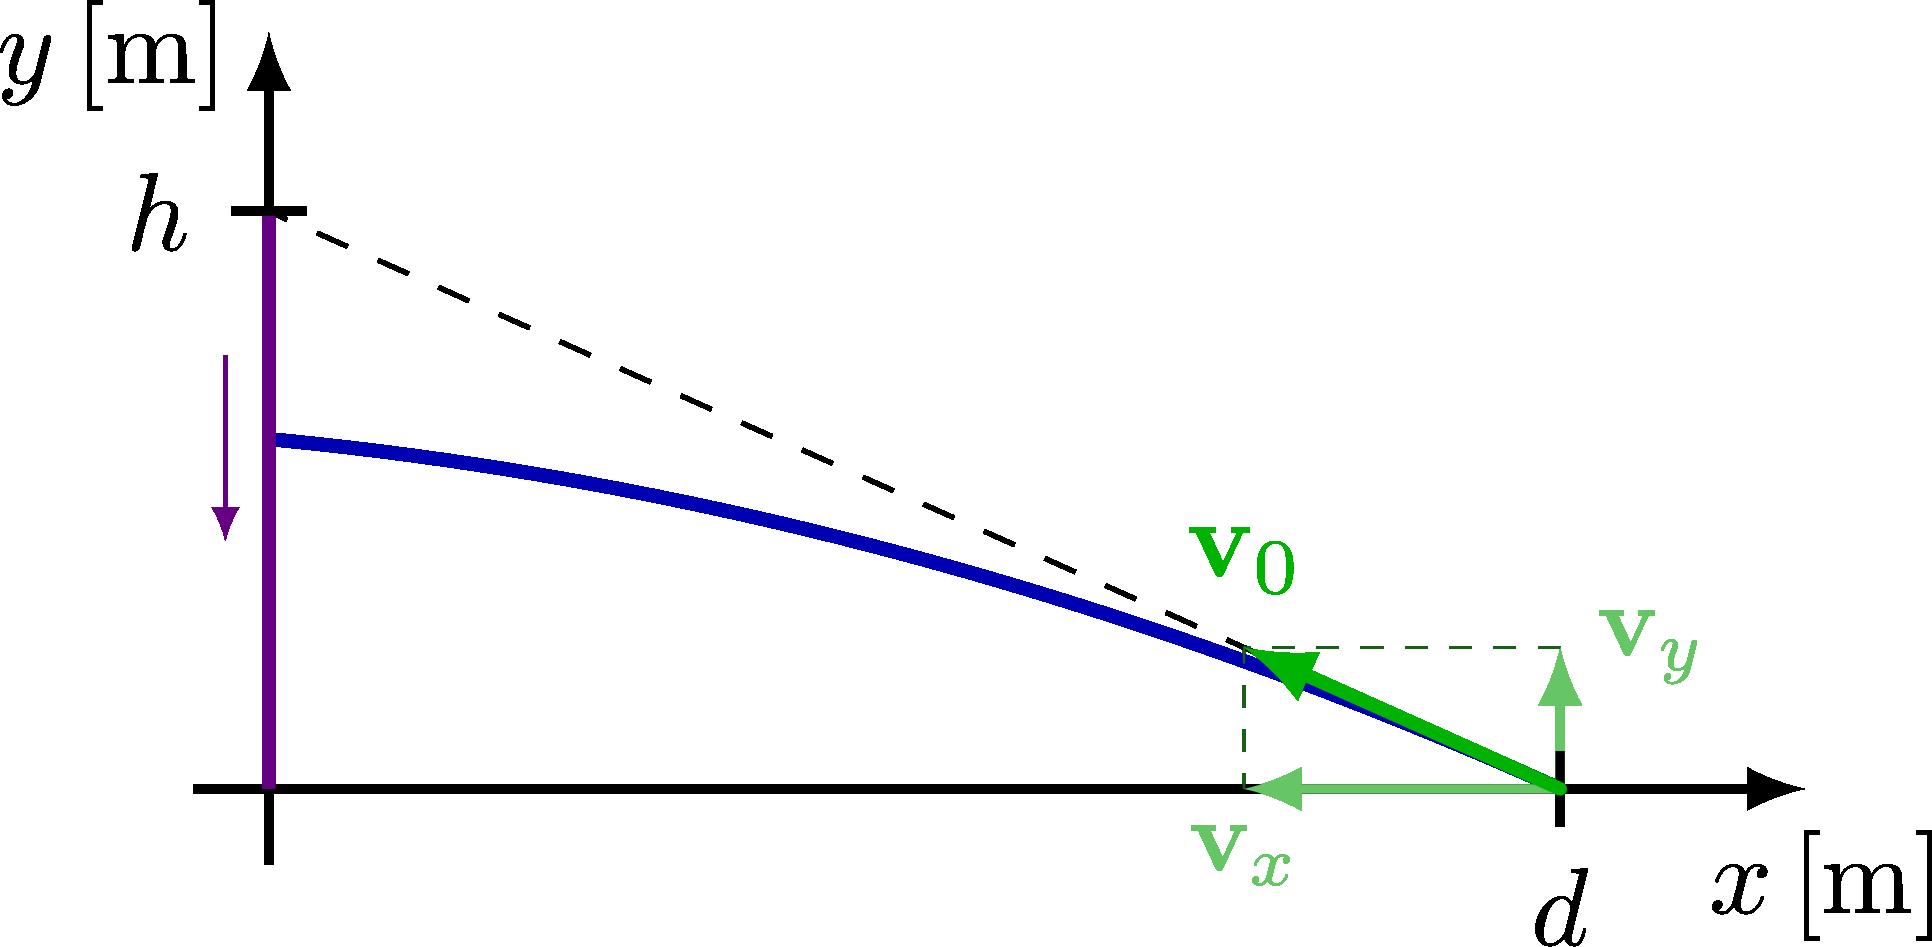 kinematics_trajectory_monkey-001.png